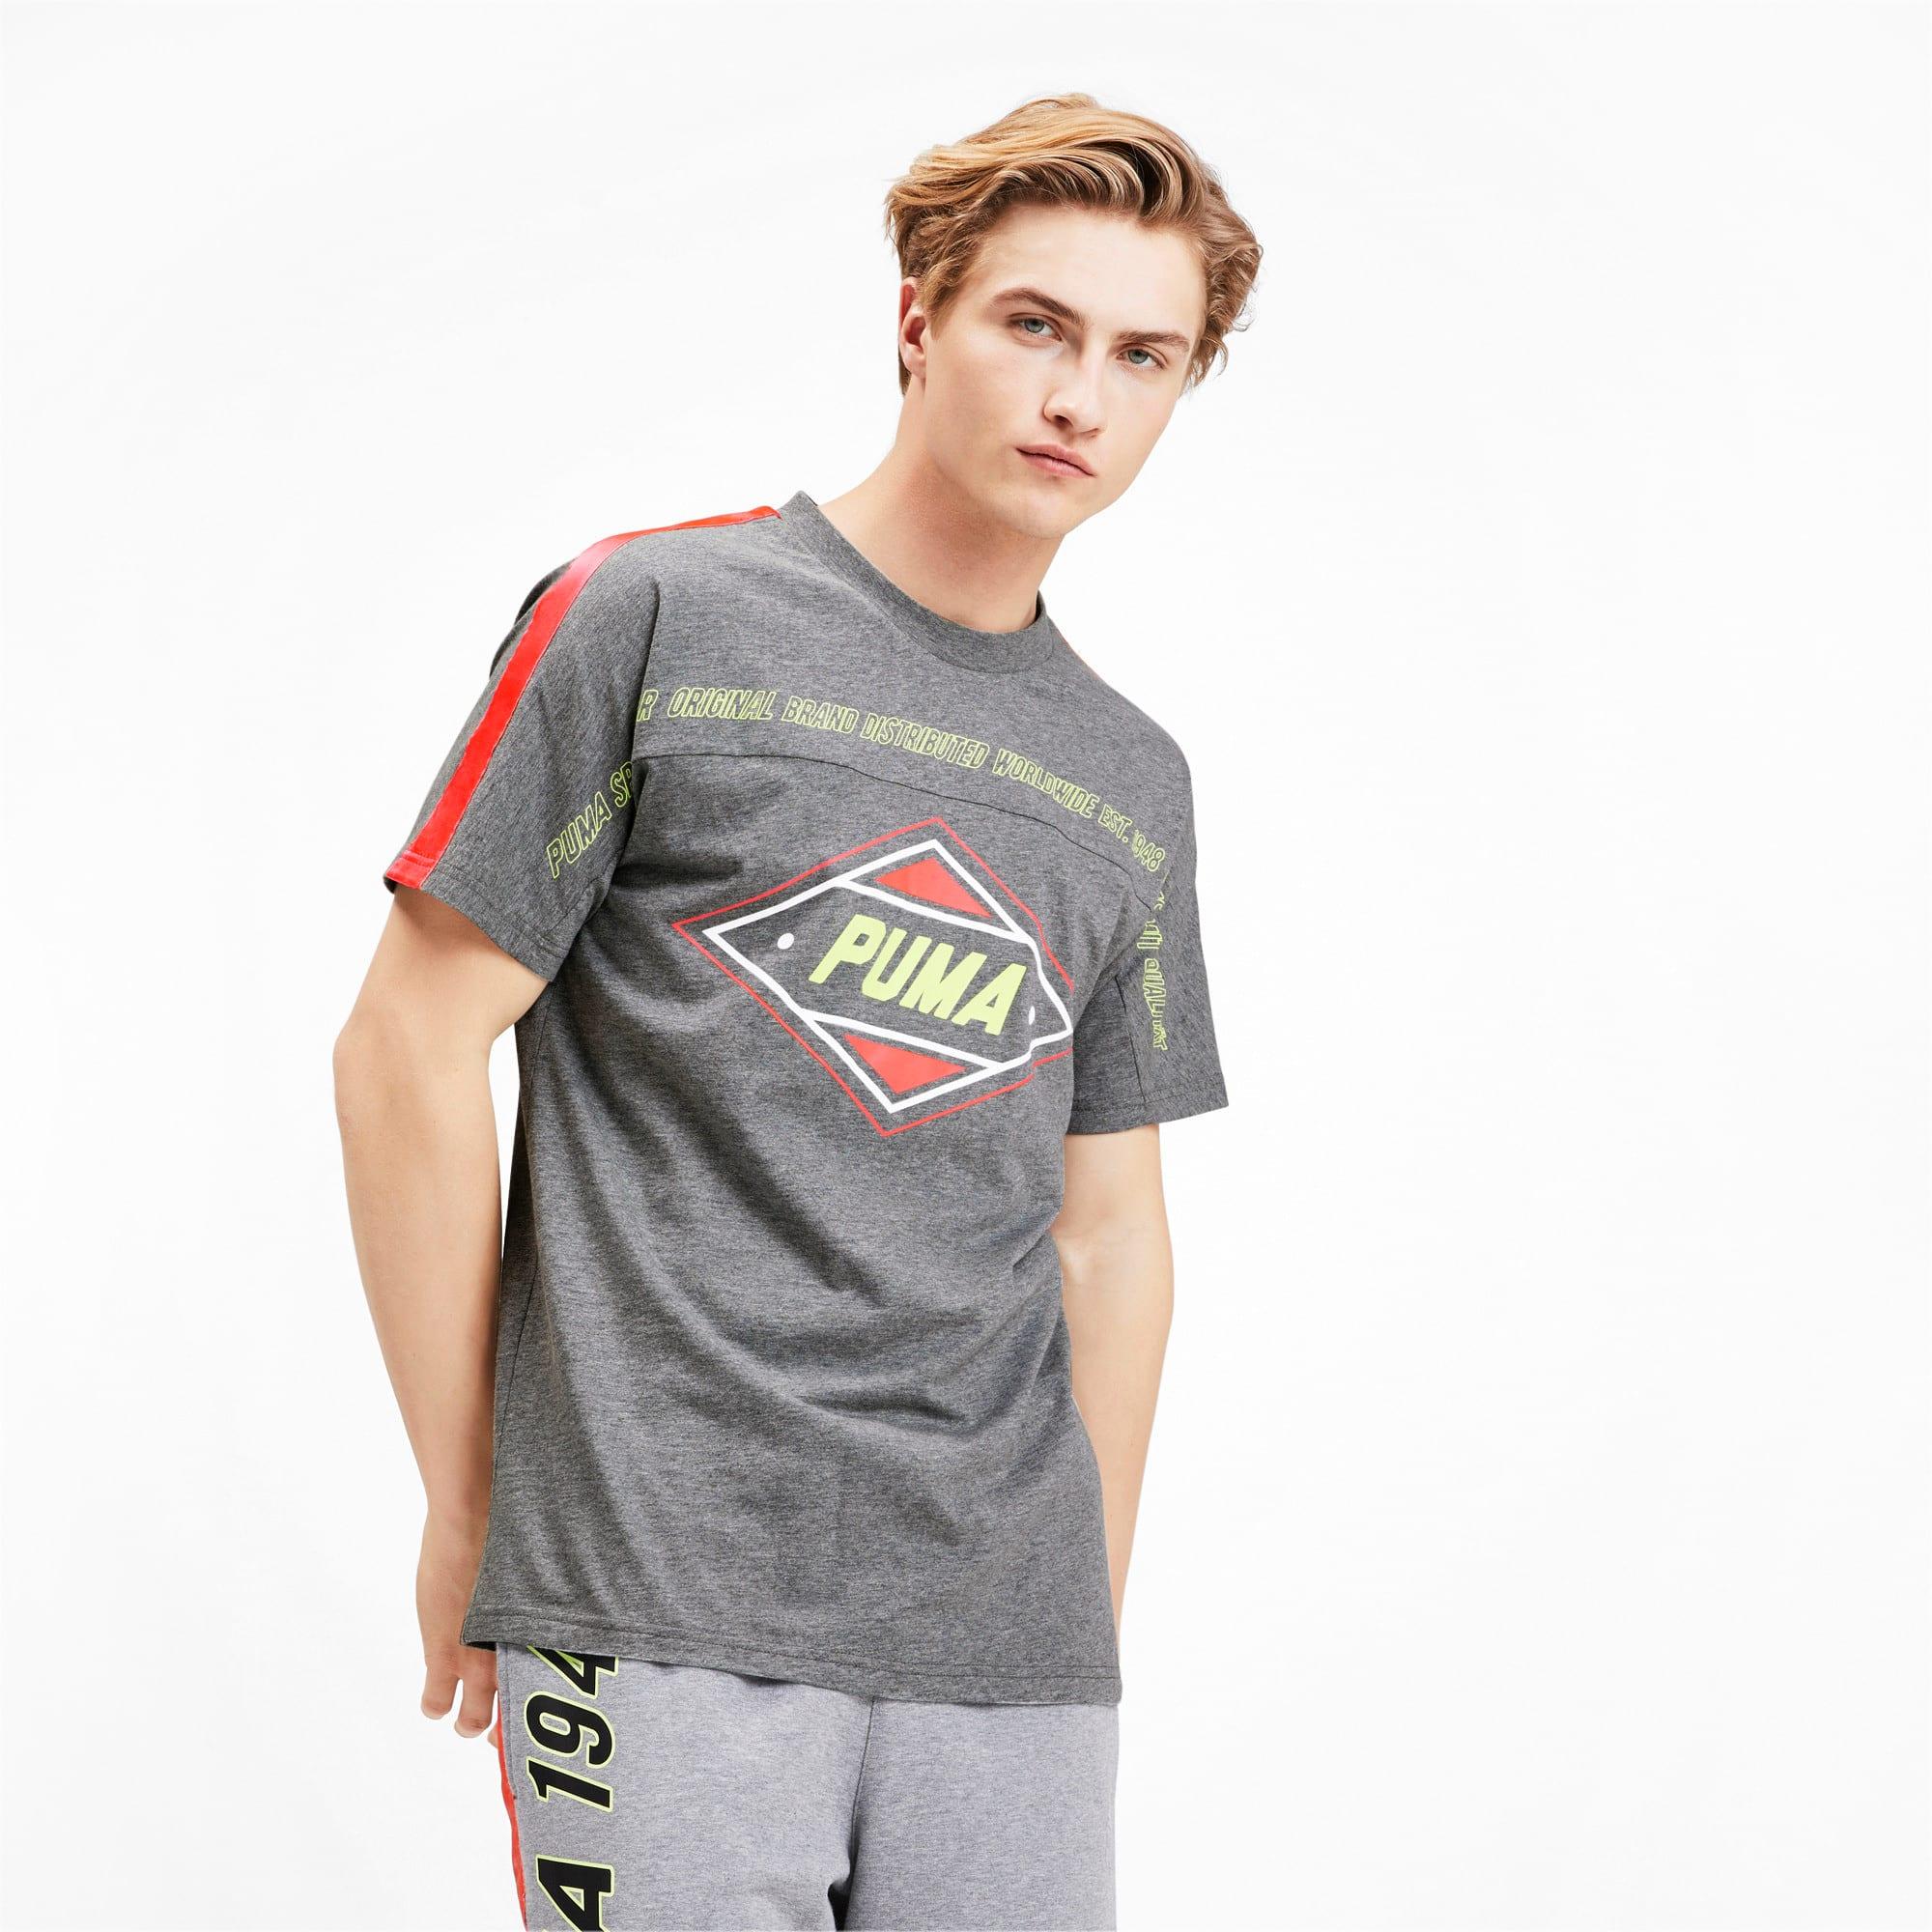 Miniatura 1 de Camiseta luXTG para hombre, Medium Gray Heather, mediano